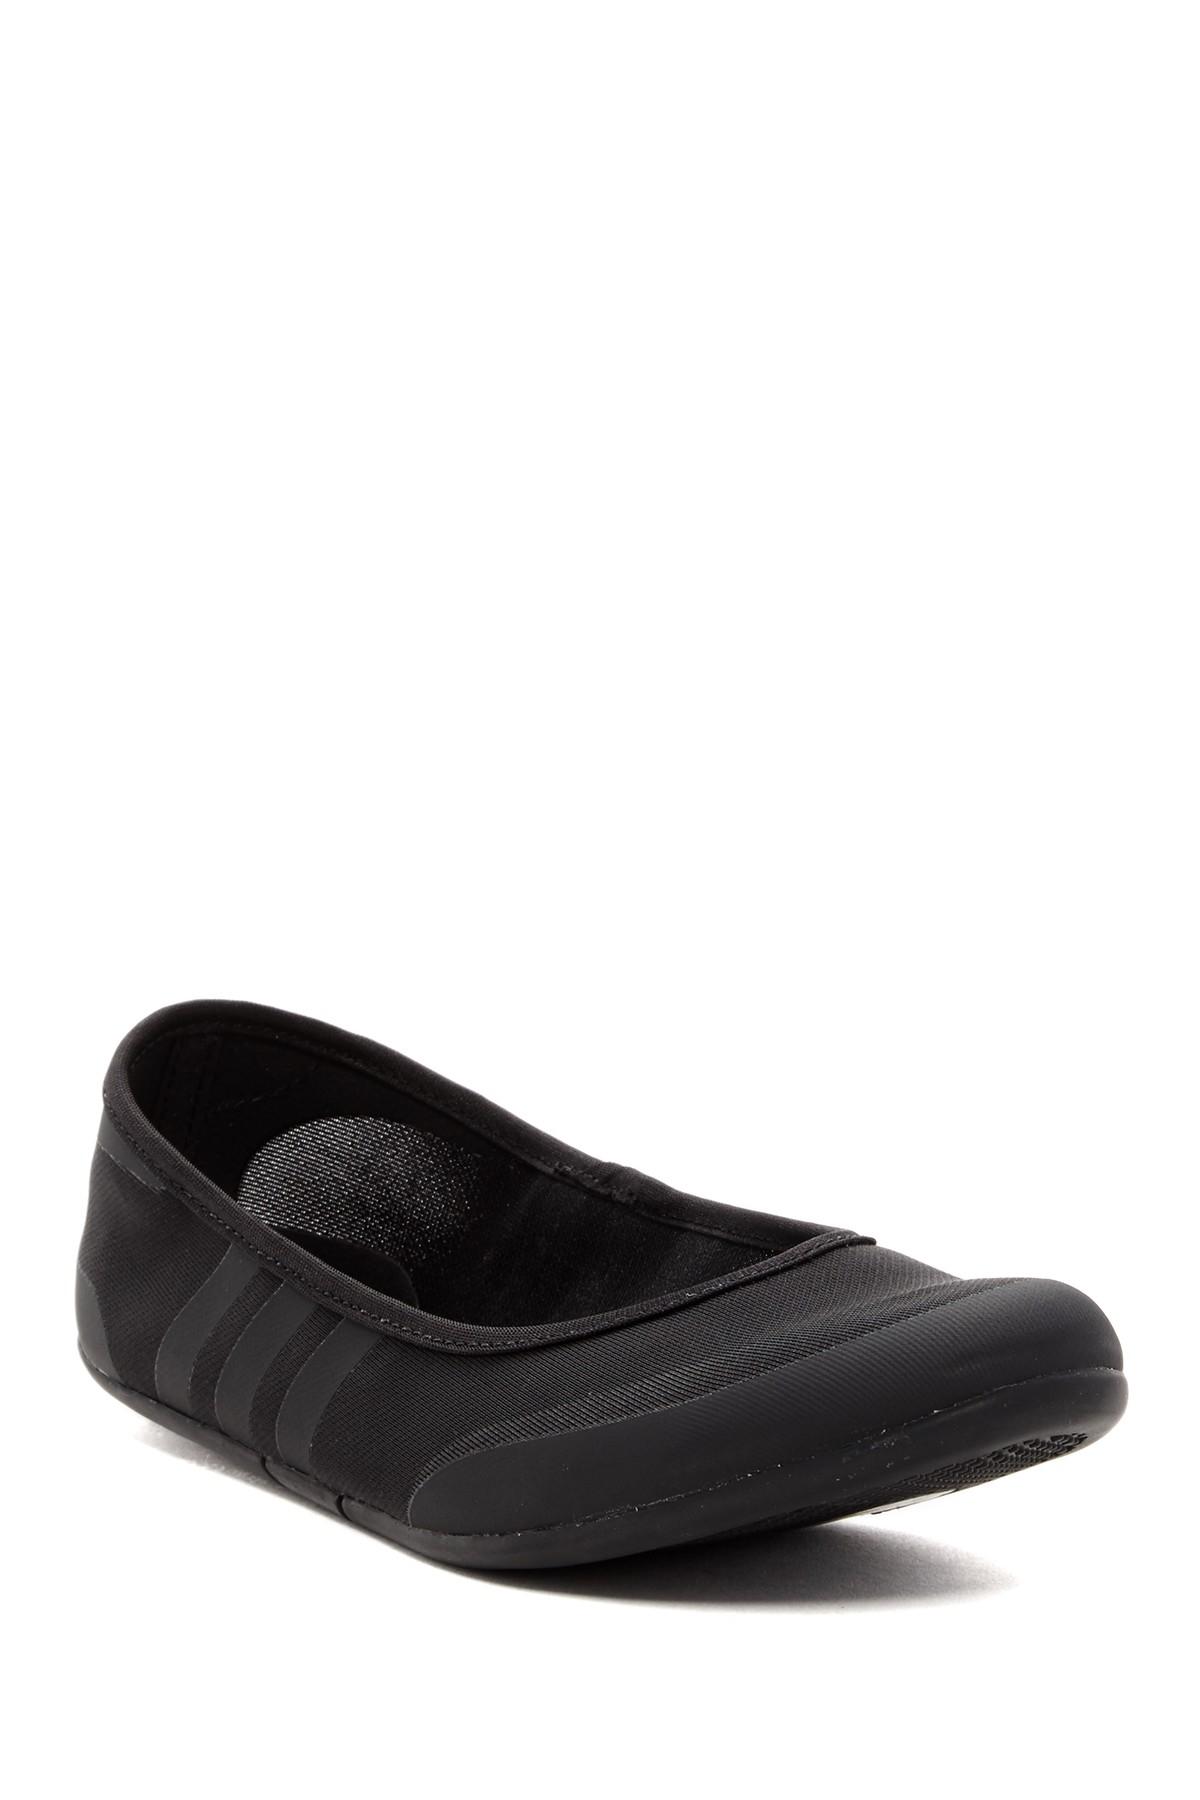 Lyst - Adidas Originals Sulina Athletic Ballet Flat In Black